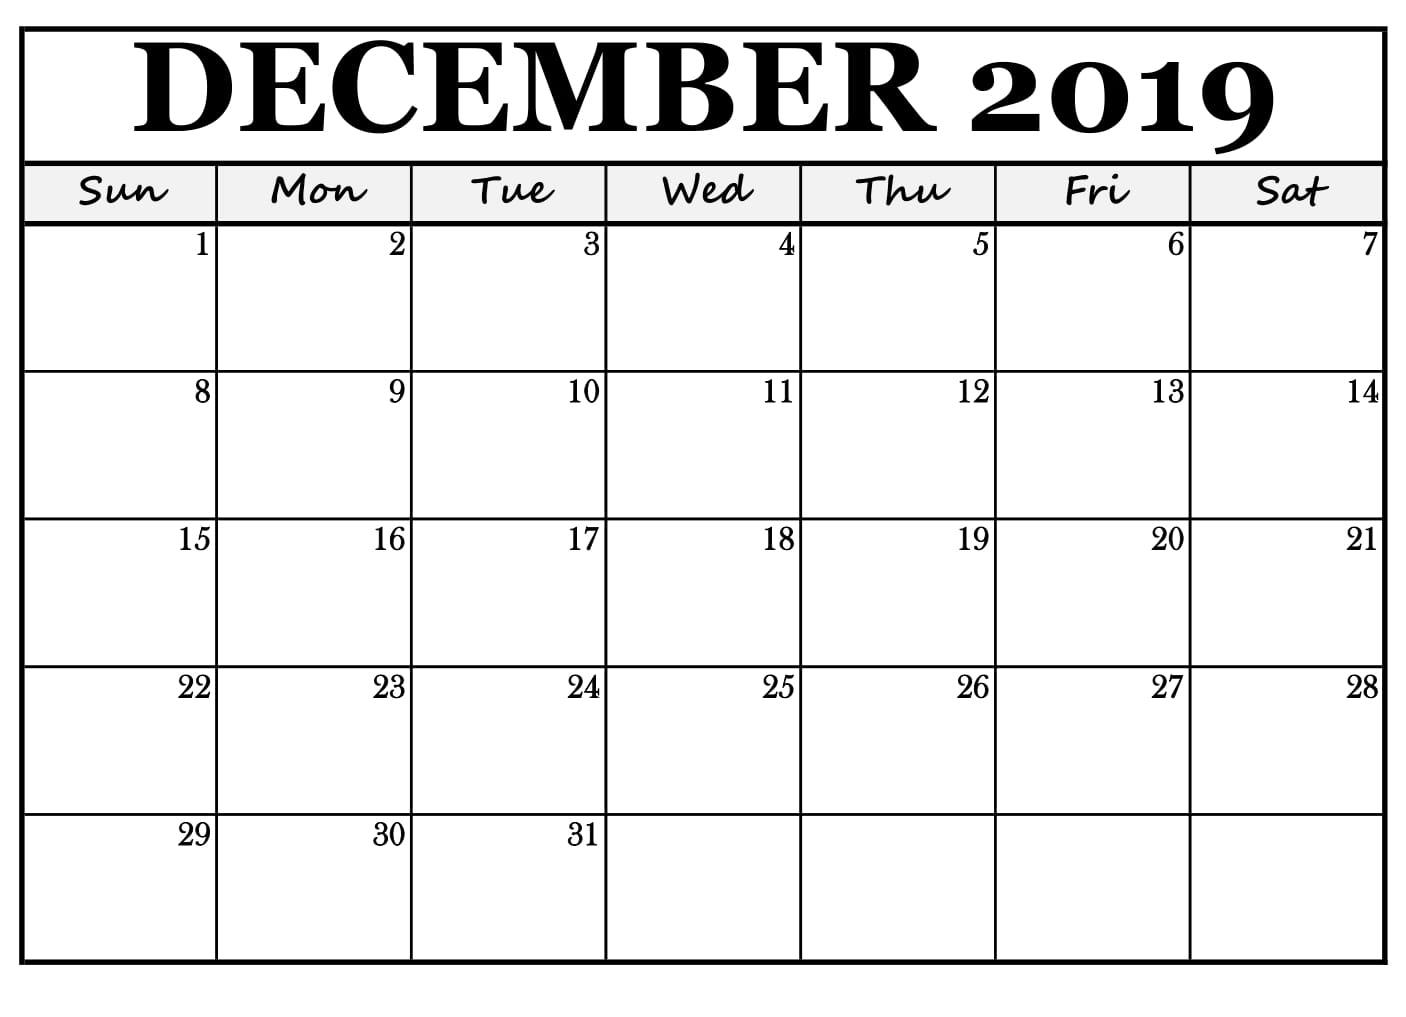 December 2019 Calendar Template Free Printable | Printable